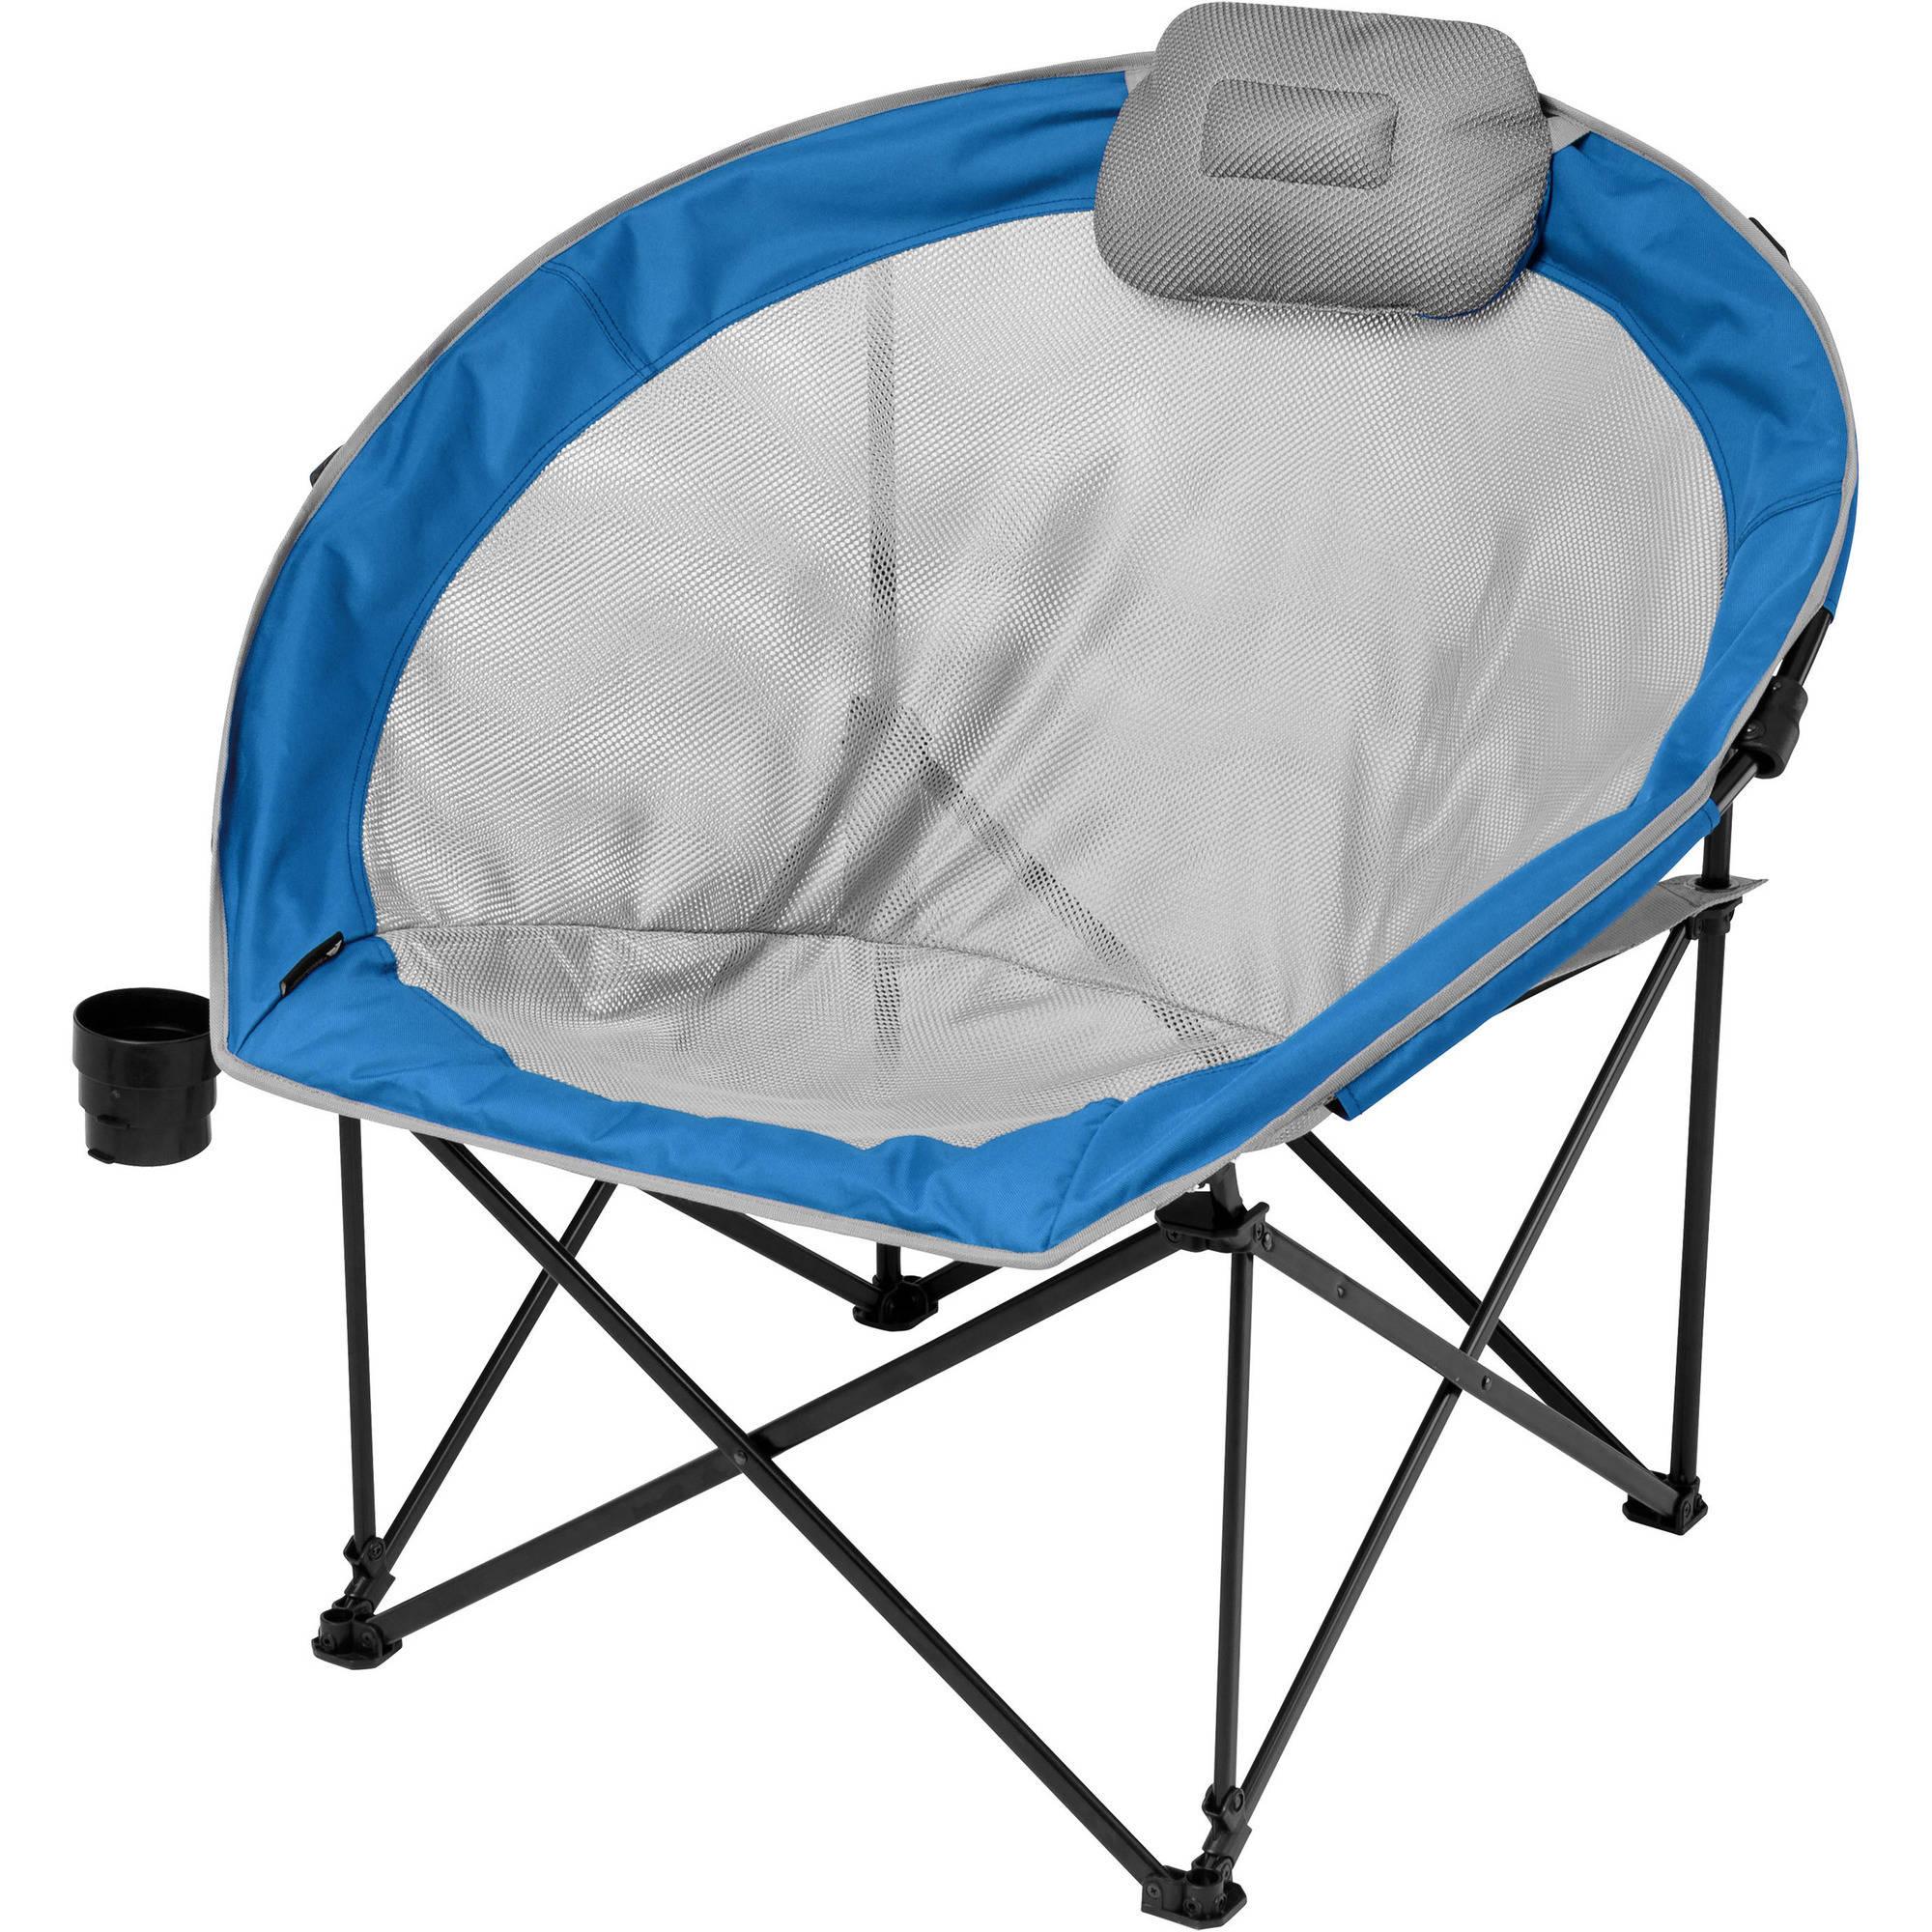 Ozark Trail Oversized Cozy Camp Chair Blue Walmart